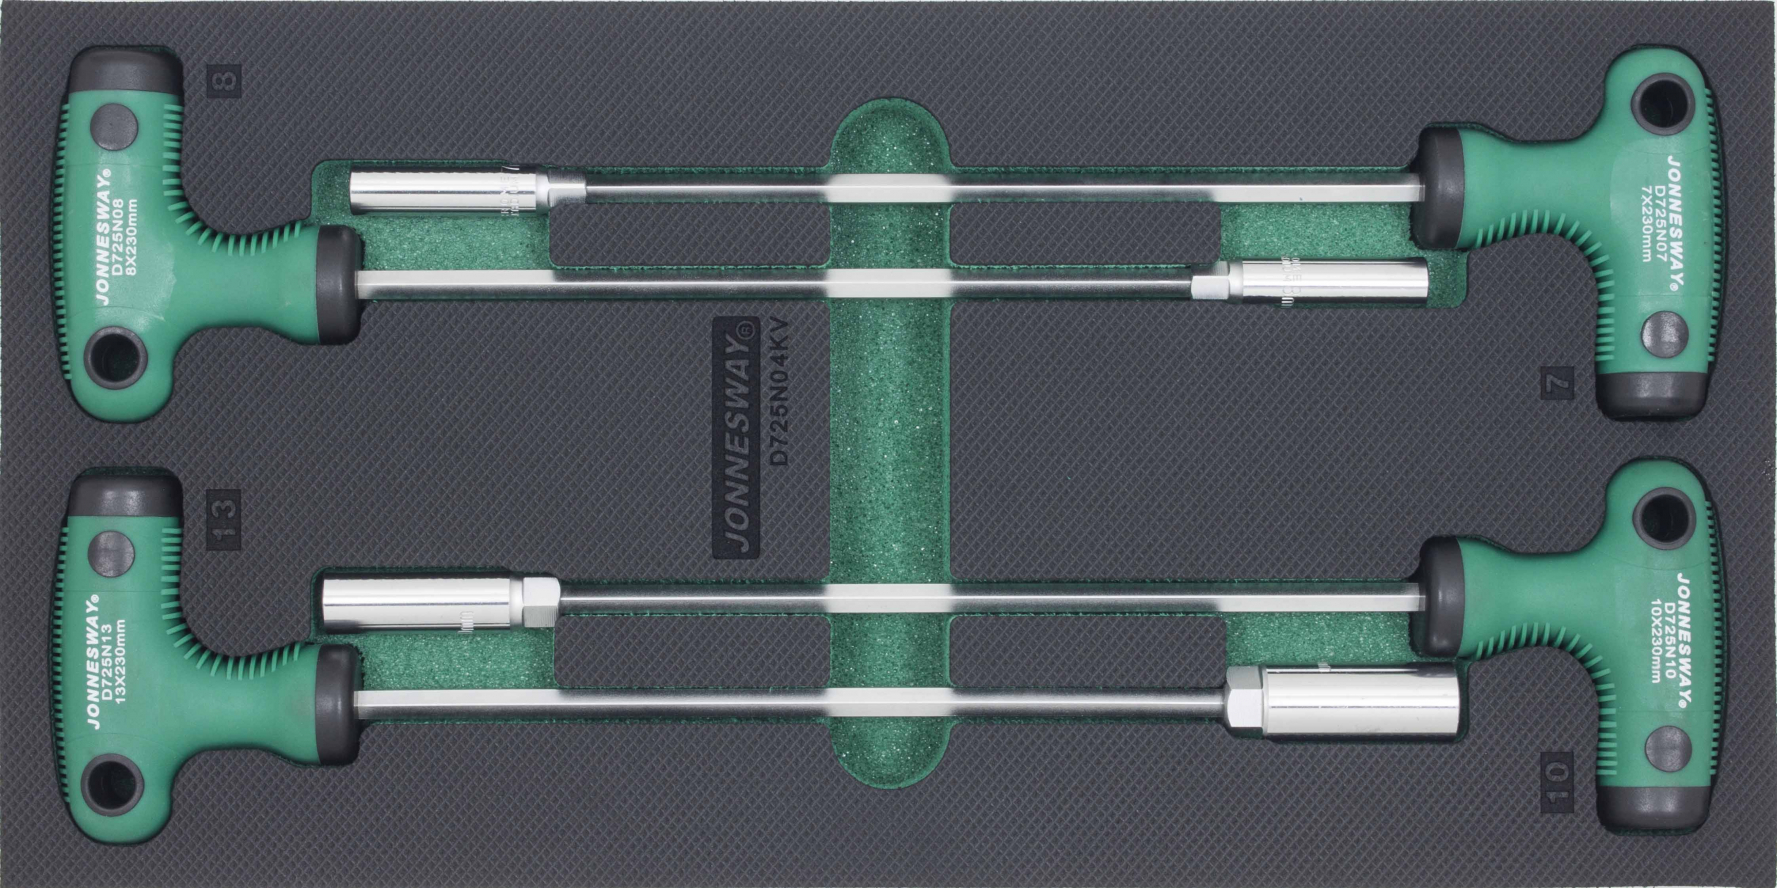 Modul pěnový - nástrčné klíče s T rukojetí, 7 - 13 mm, sada 4 ks - JONNESWAY D725N04KV